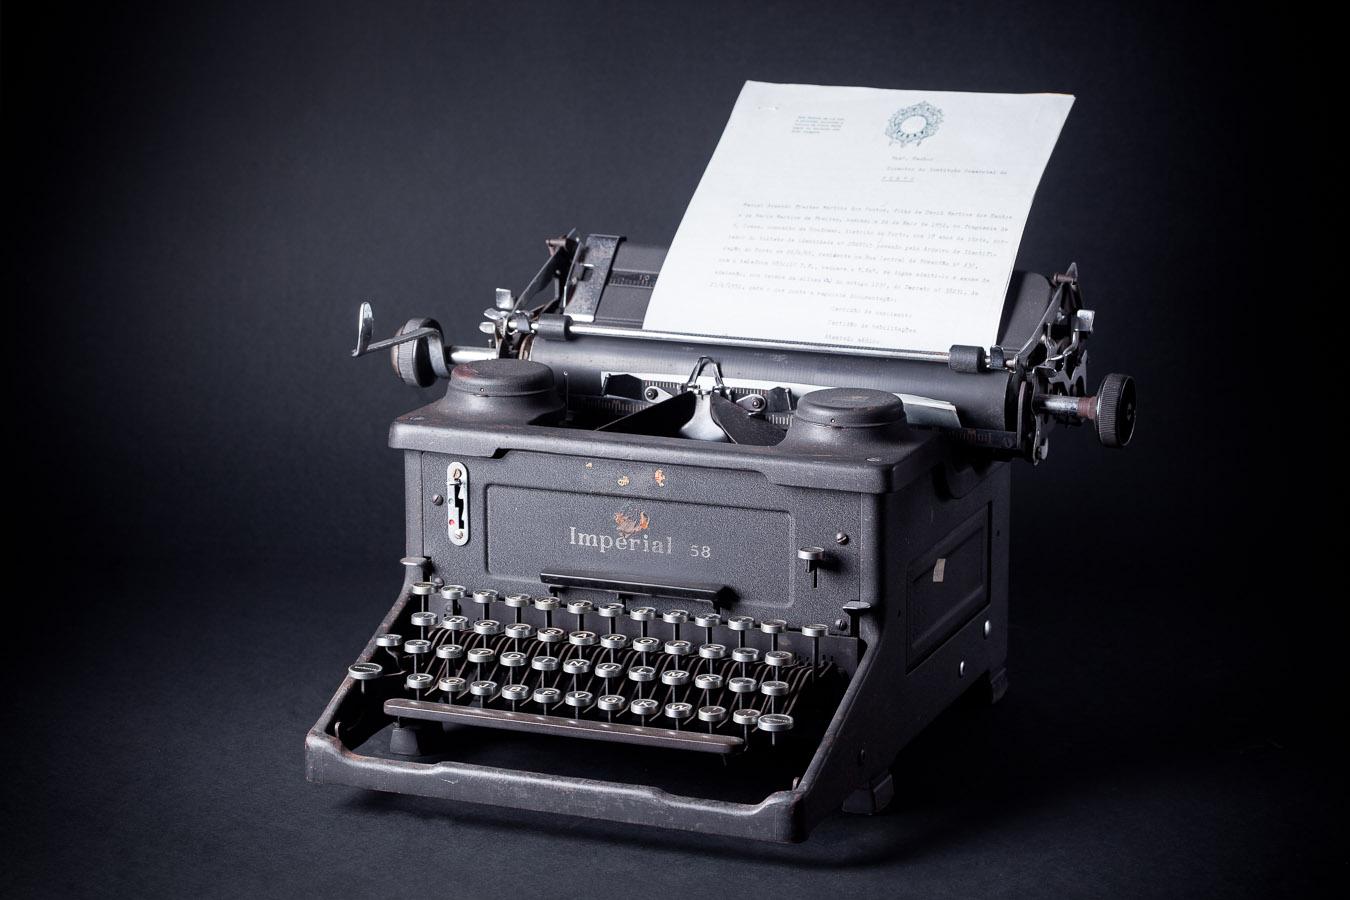 ISCAP – livro dos 125 anos